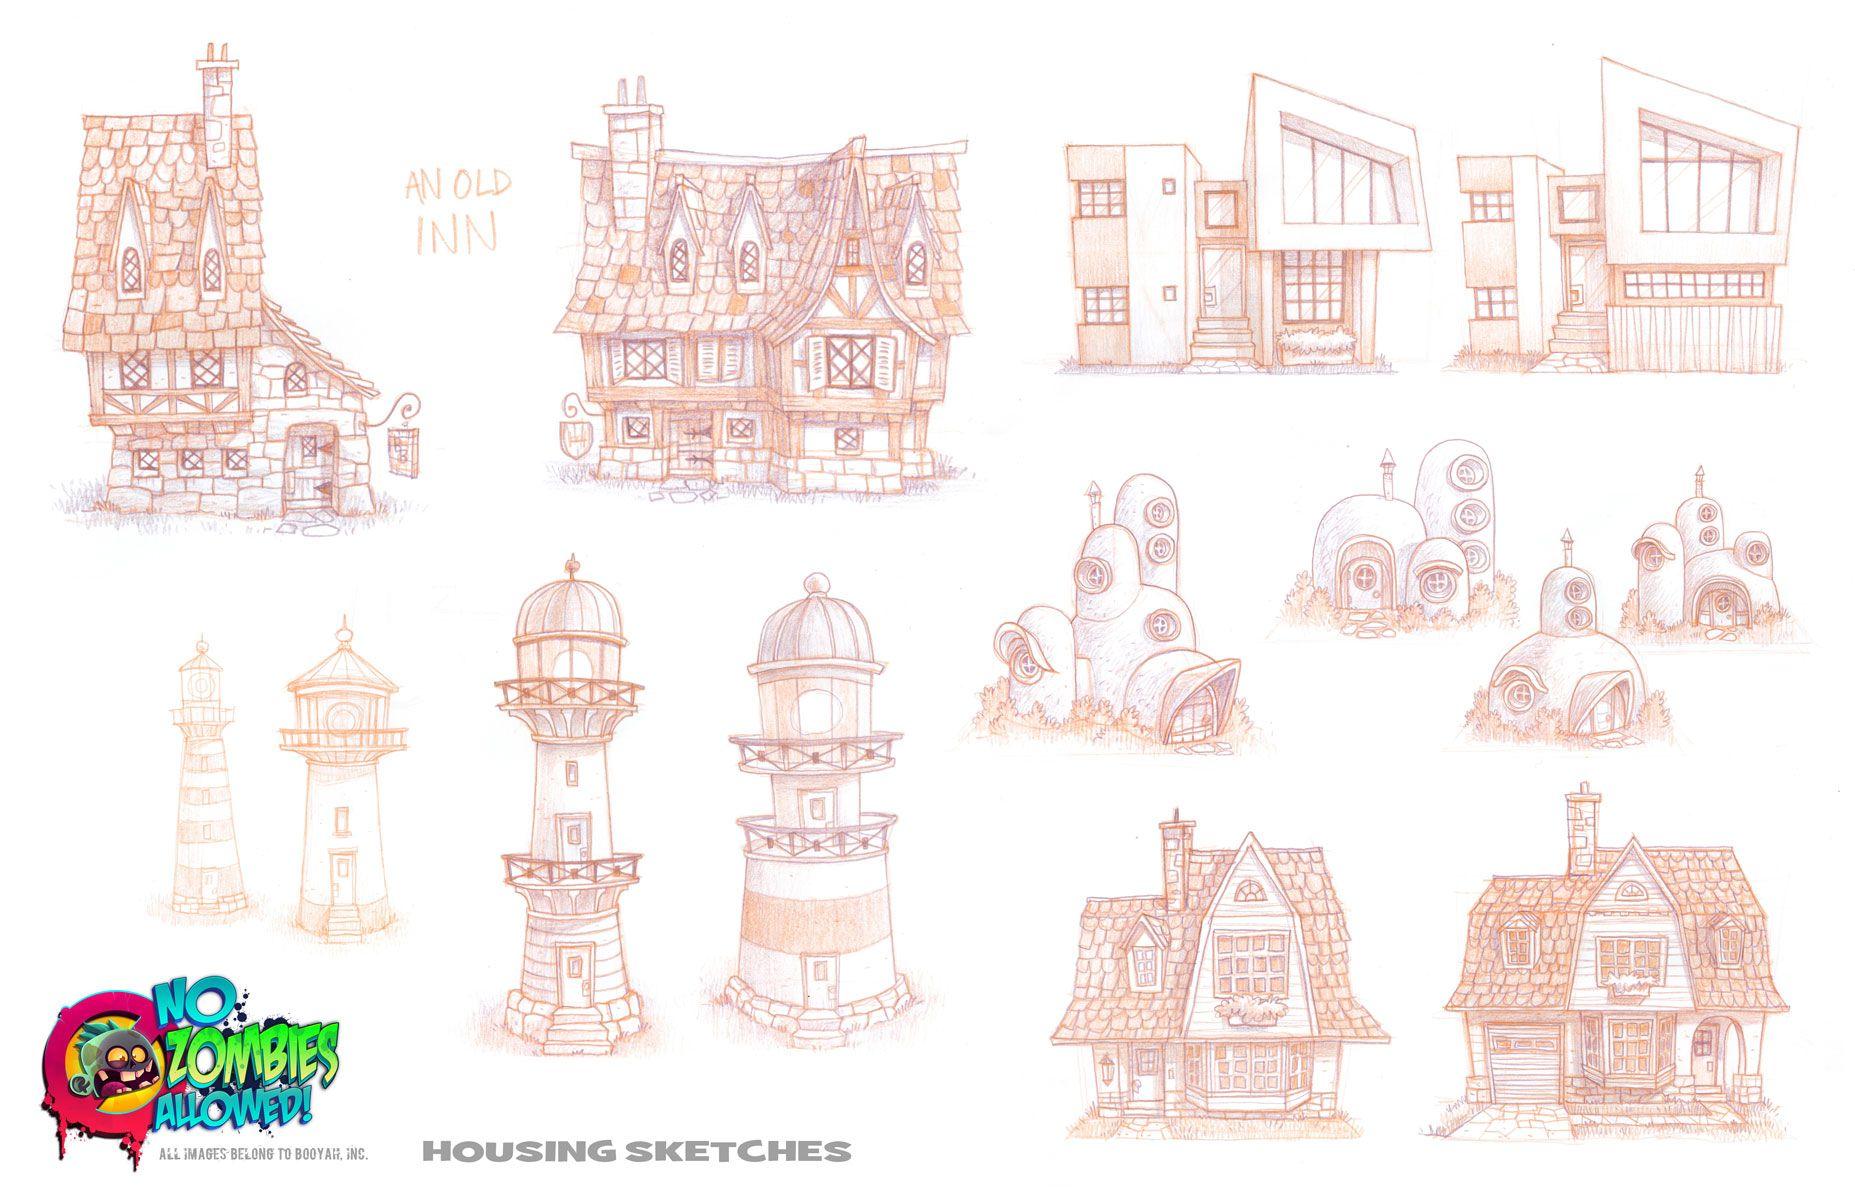 NZA! Sketches by petura.deviantart.com on @deviantART